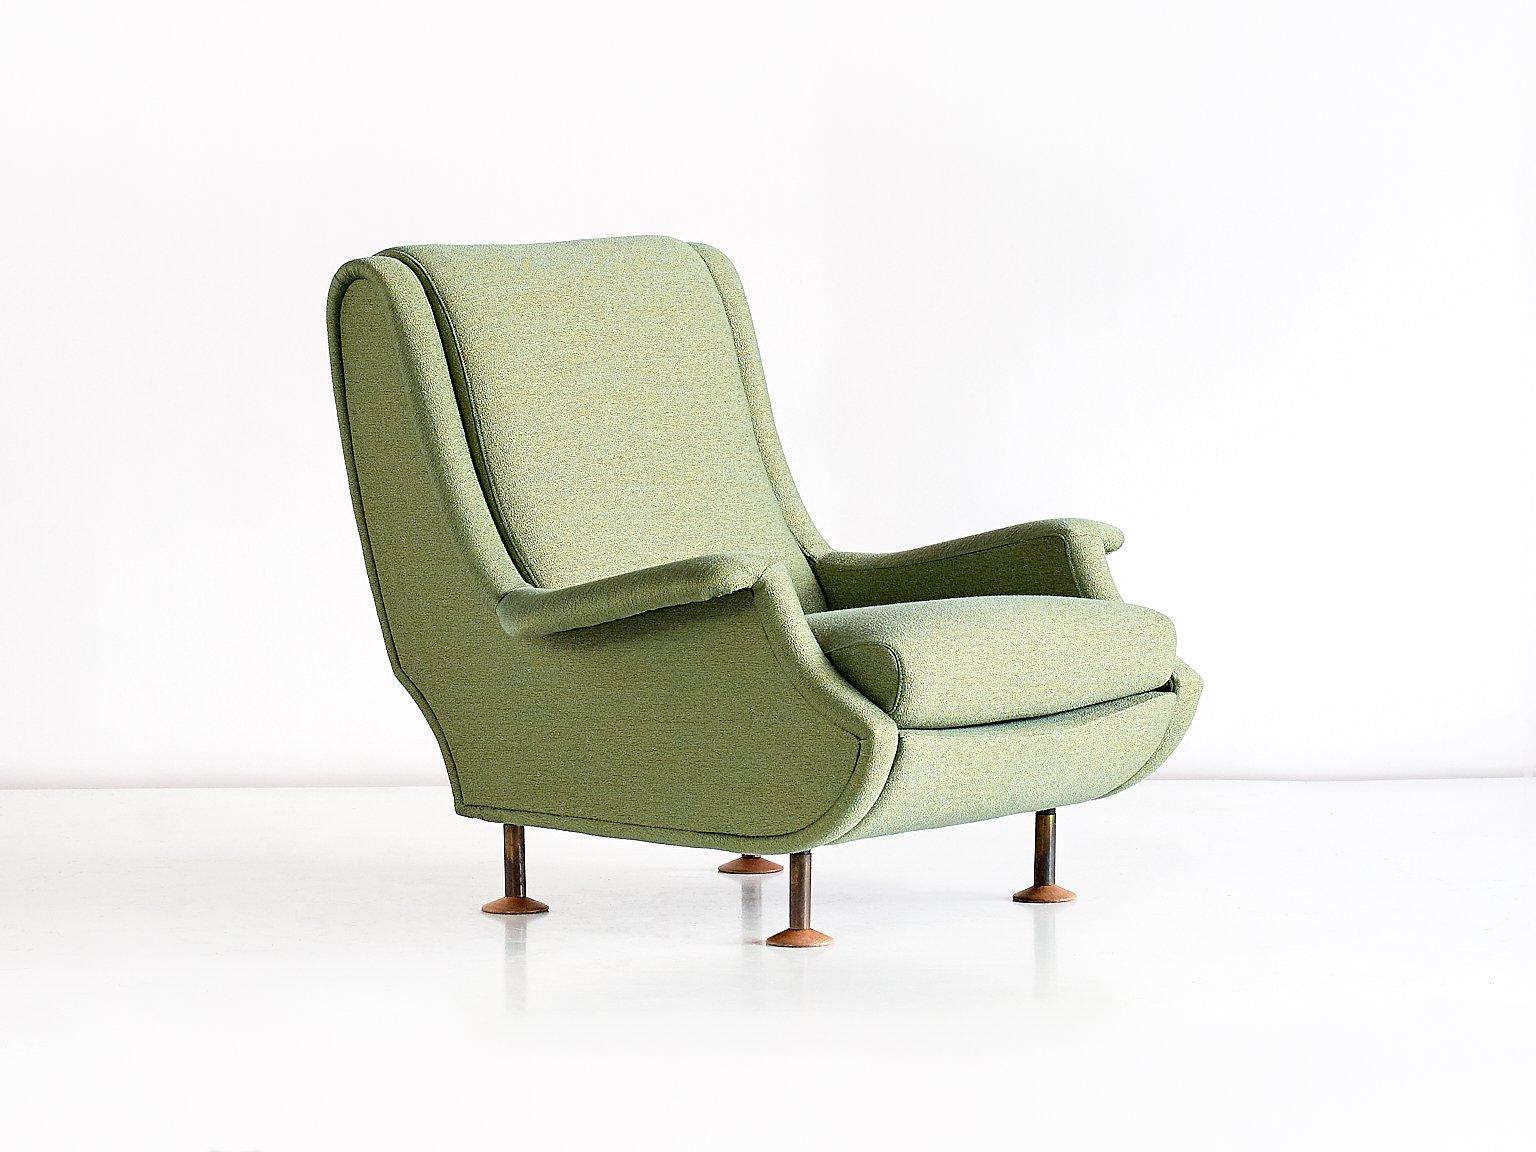 regent sessel von marco zanuso f r arflex 1960er bei. Black Bedroom Furniture Sets. Home Design Ideas